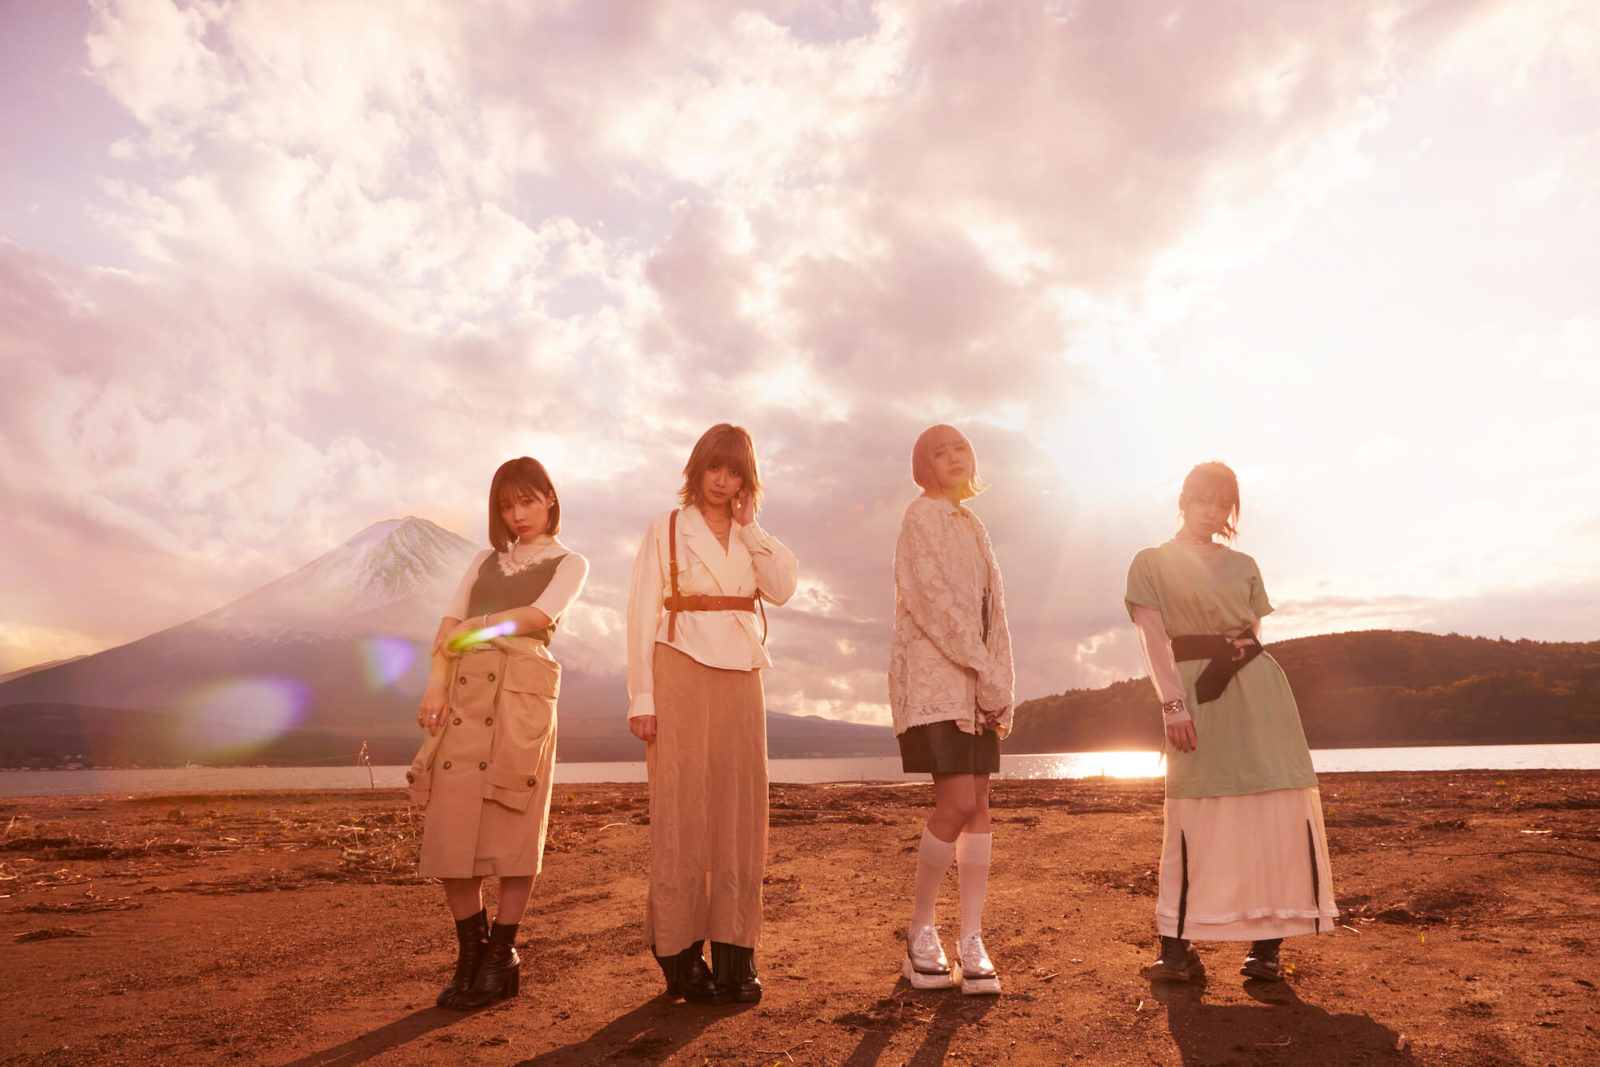 SILENT SIREN バンド結成10周年記念ライブ開催延期を発表。先行配信をスタートした「Answer」のMV公開サムネイル画像